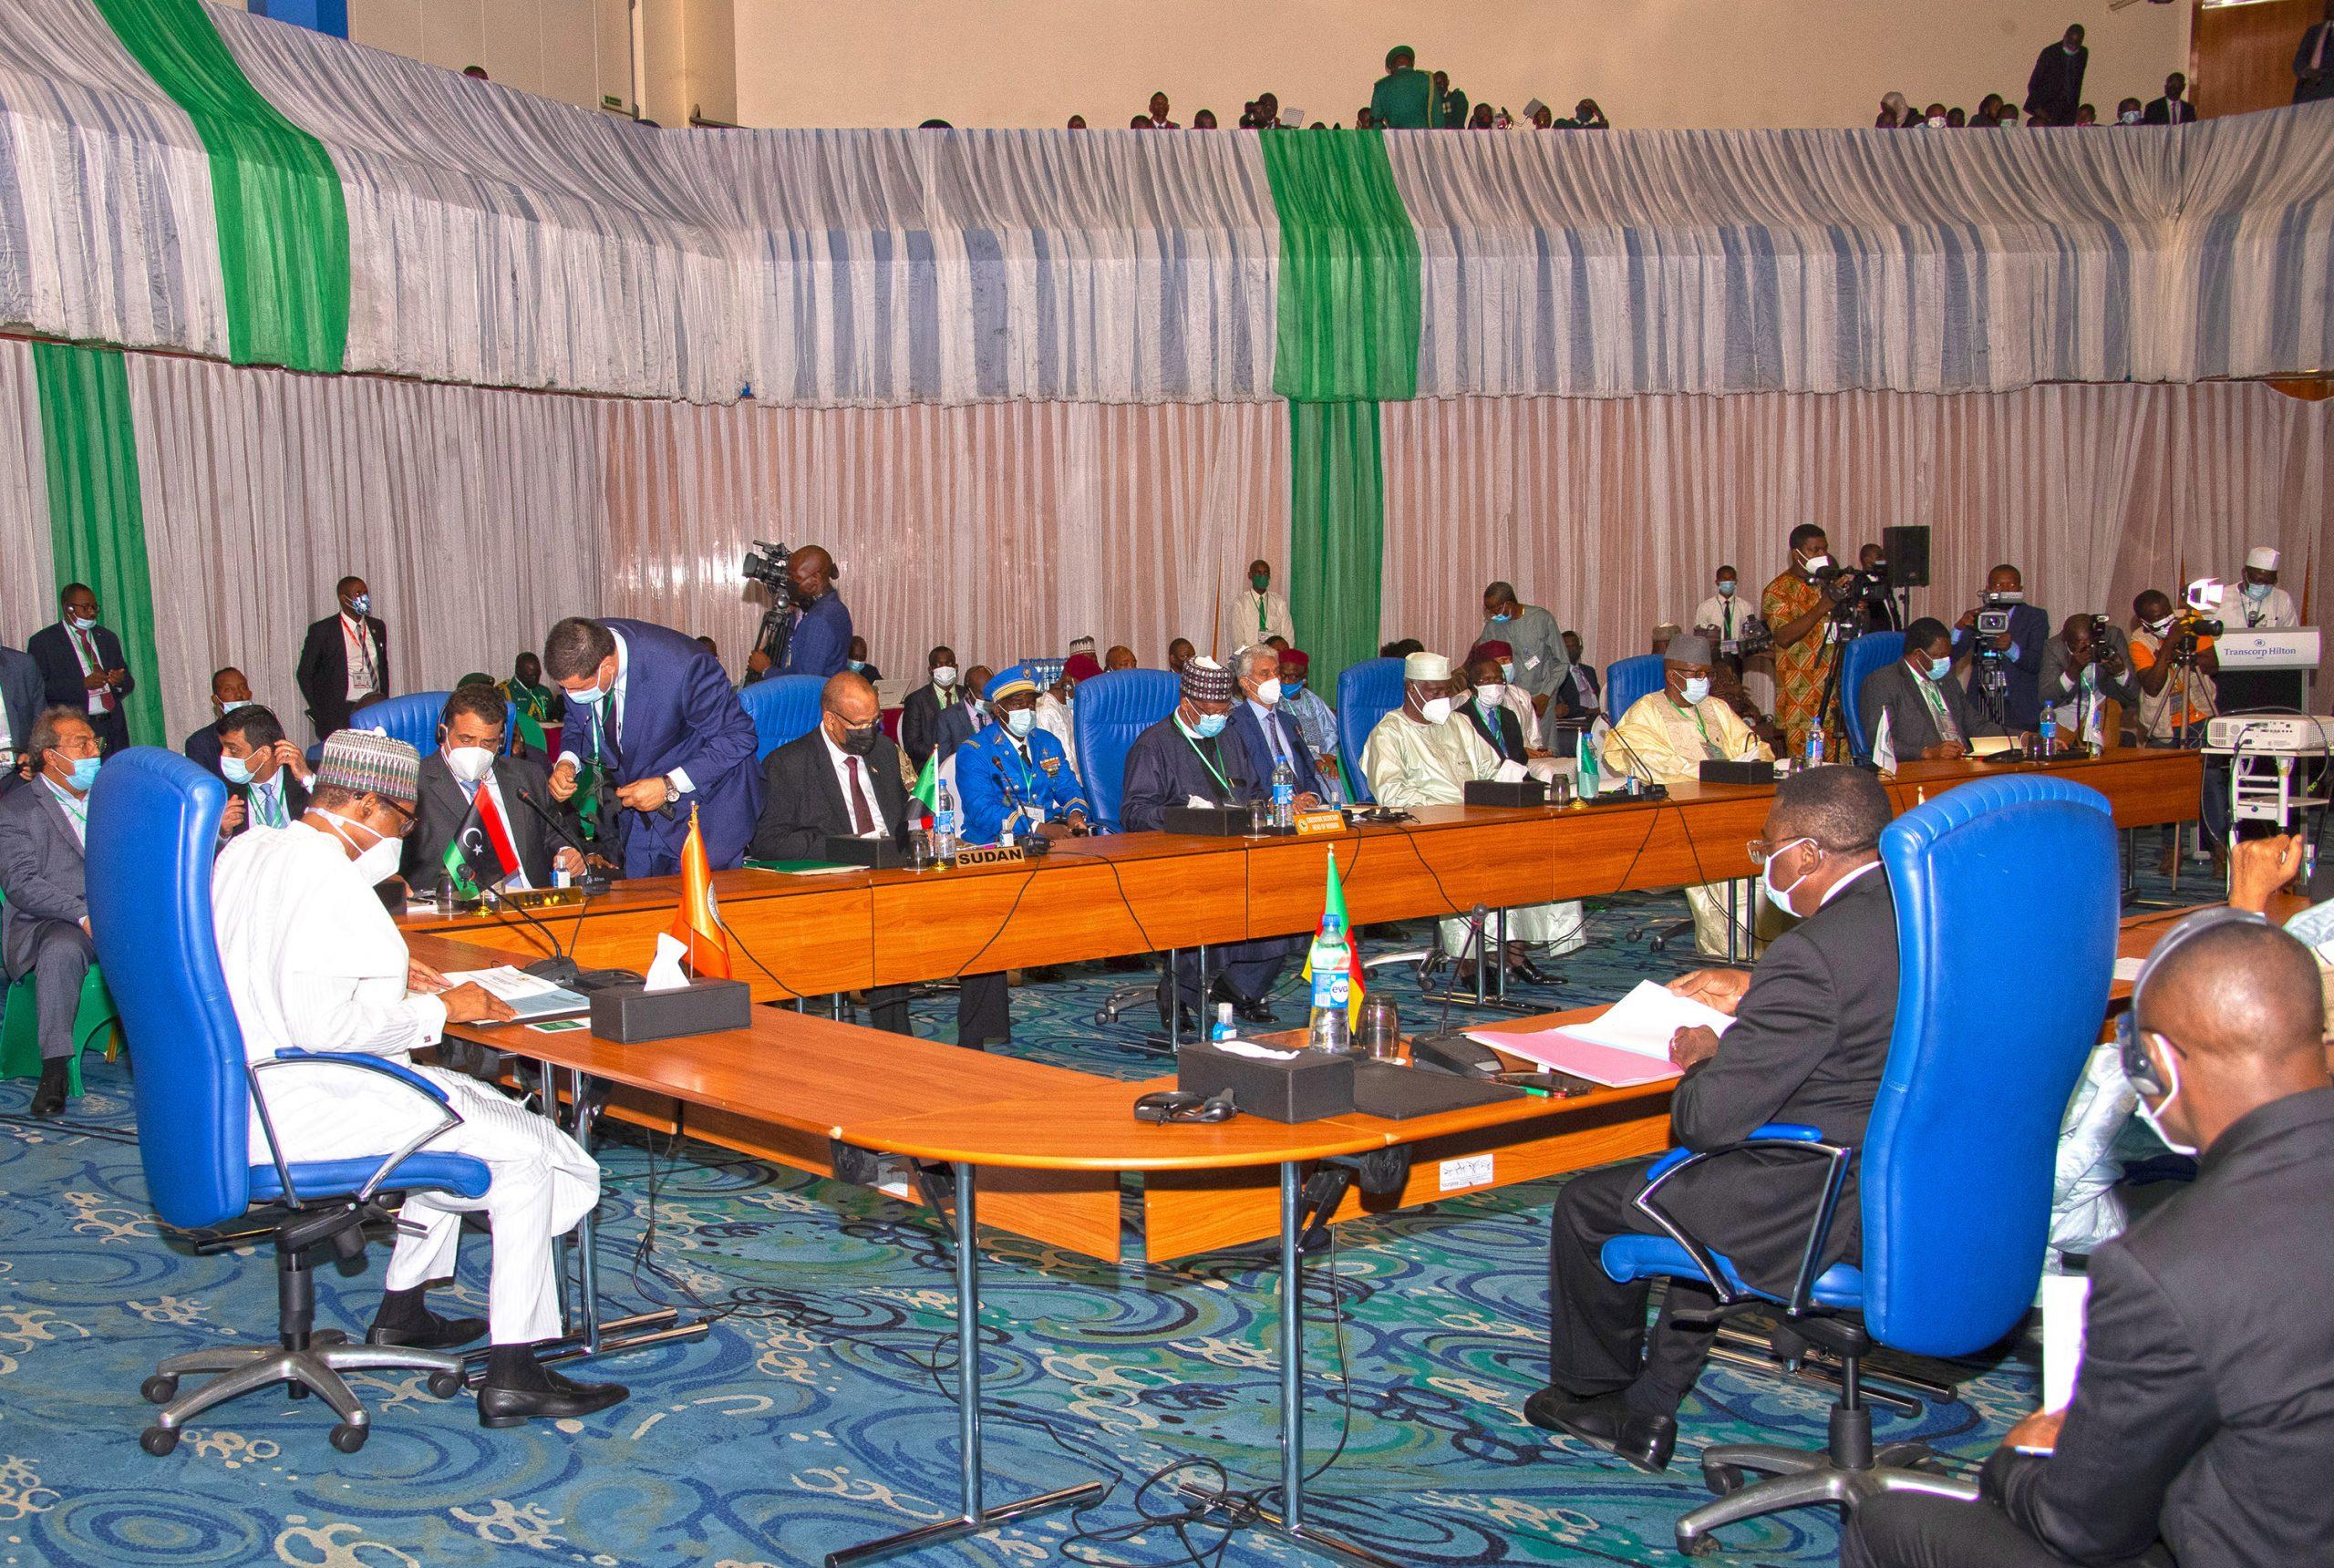 PRESIDENT BUHARI CHAIRS LAKE CHAD BASIN COMMISSION MEETING 5A President Muhammadu Buhari Chairs the Extraordinary Summit of the Lake Chad Basin Commission (LCBC) held at the Transcorp Hilton Abuja. PHOTO; SUNDAY AGHAEZE. MAY 25TH 2021